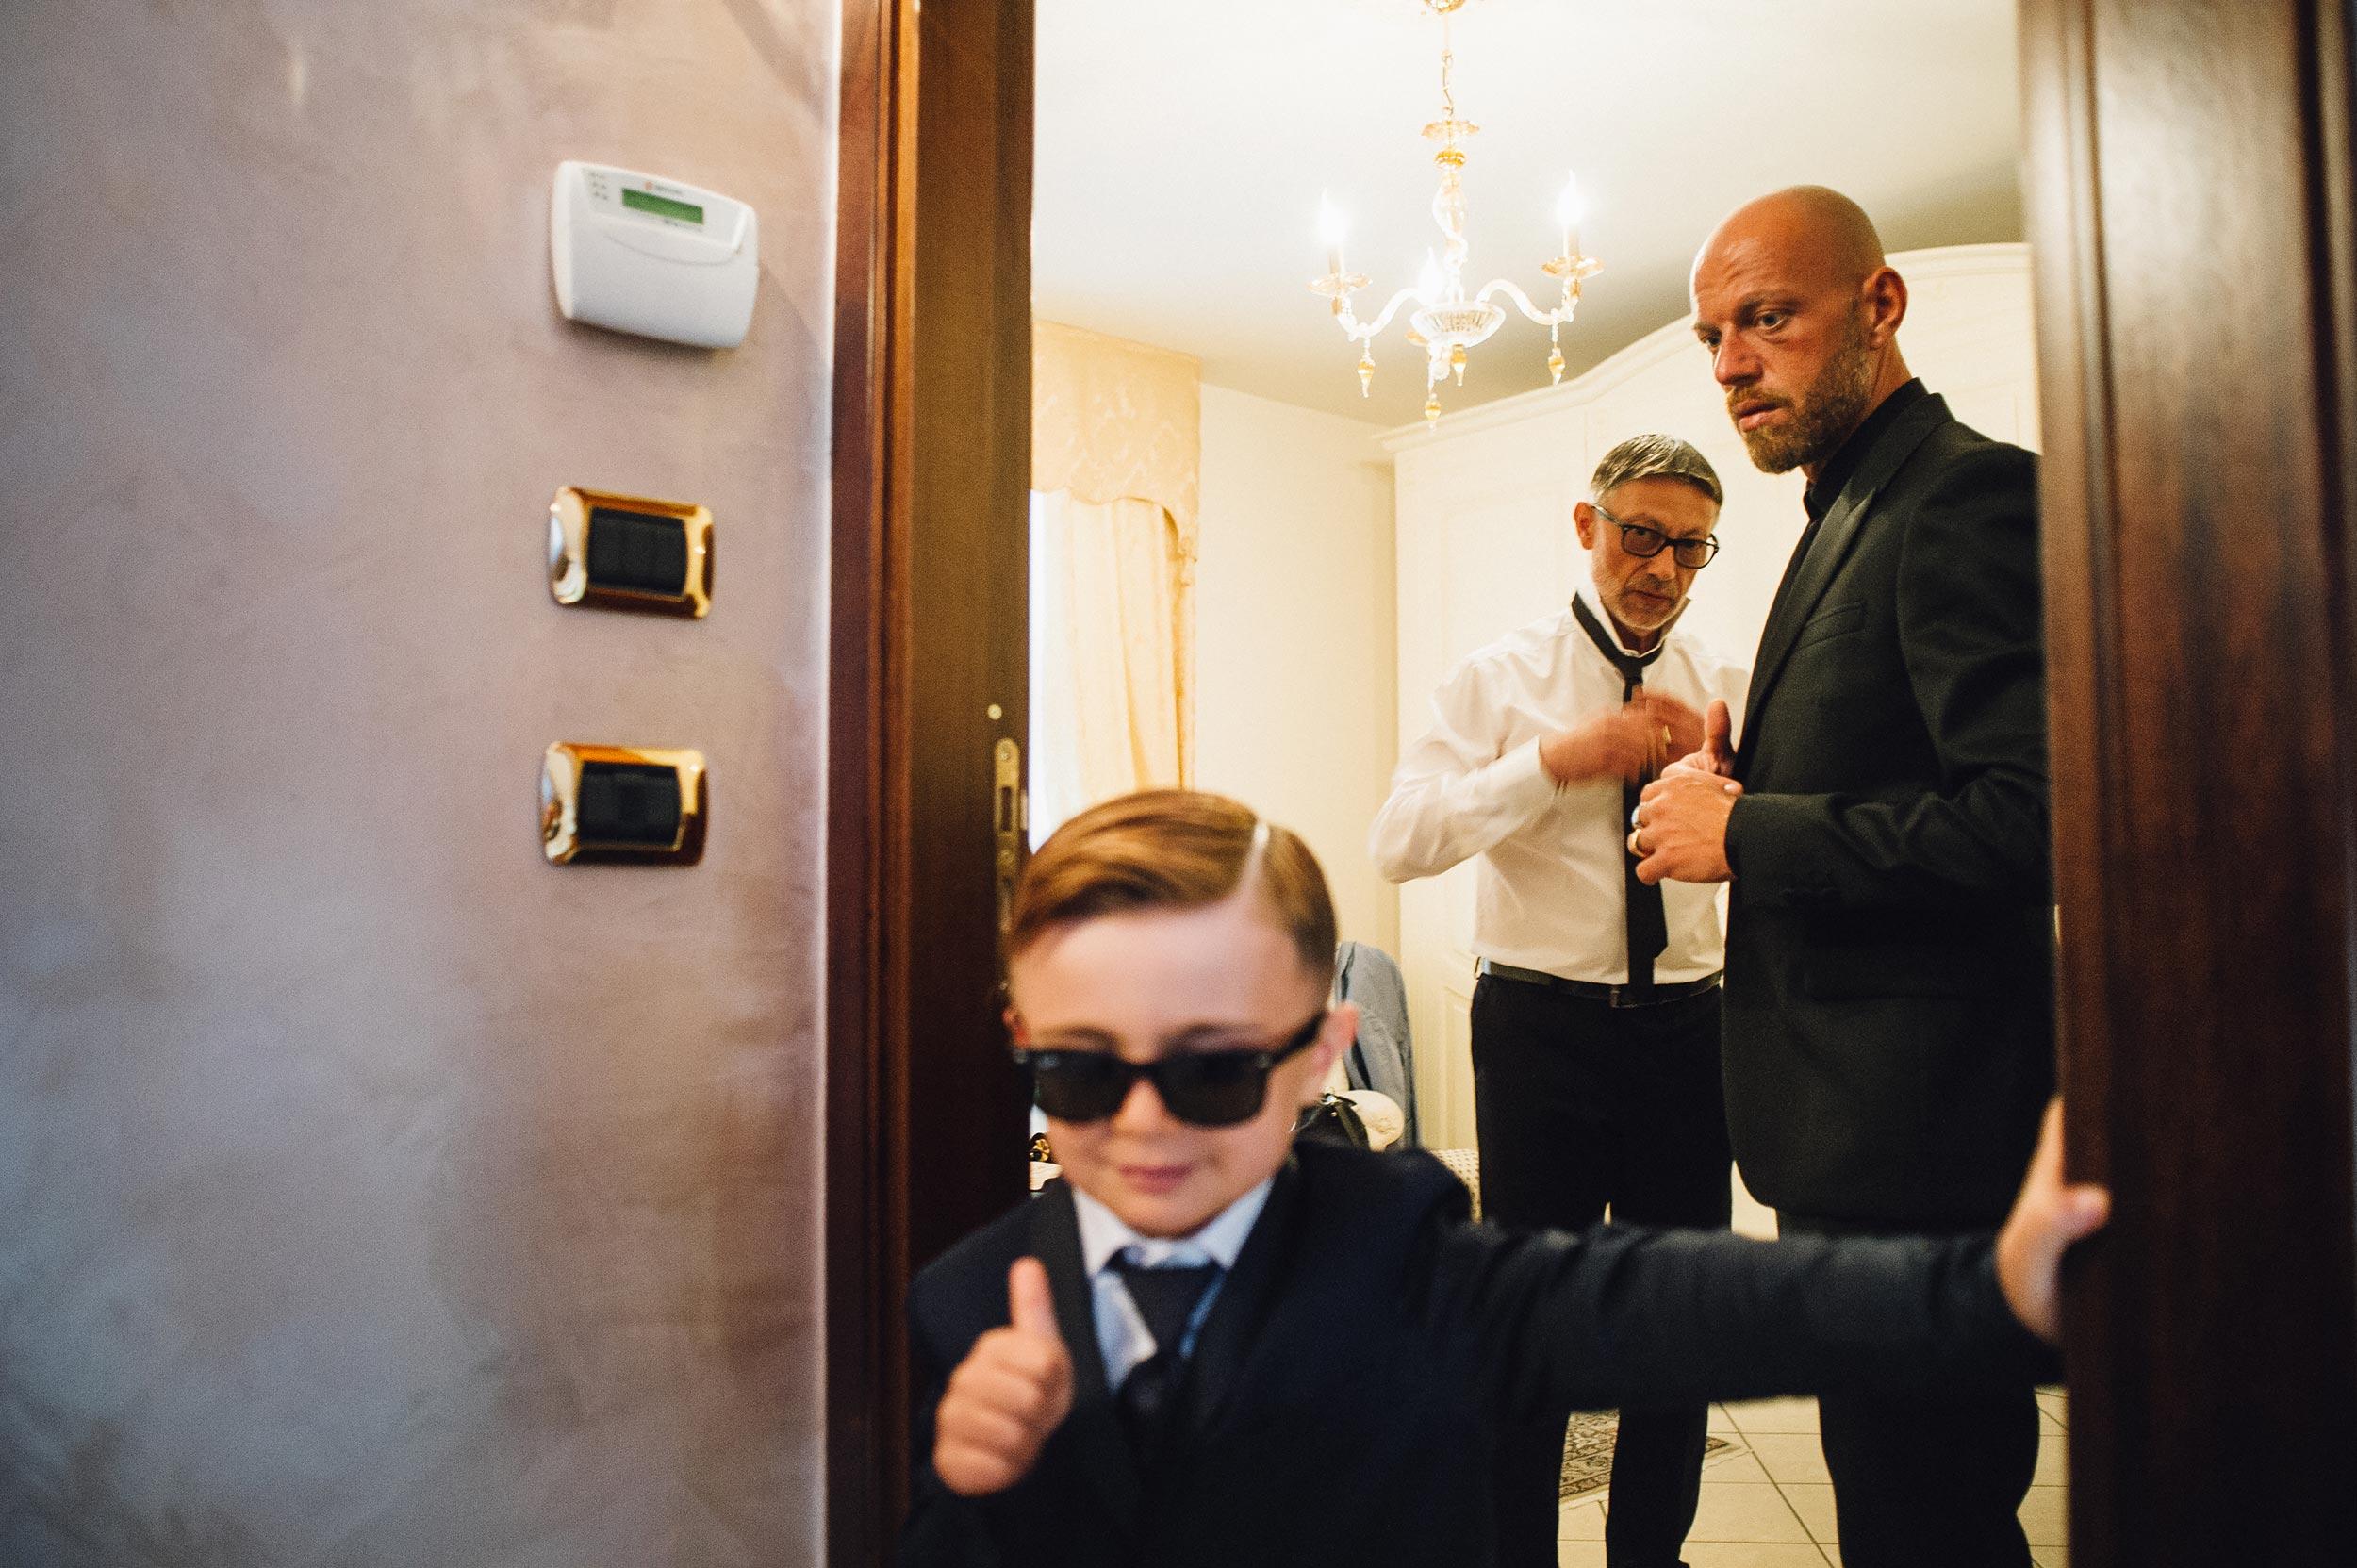 2016-Claudio-Teresa-Naples-Wedding-Photographer-Italy-Alessandro-Avenali-4.jpg